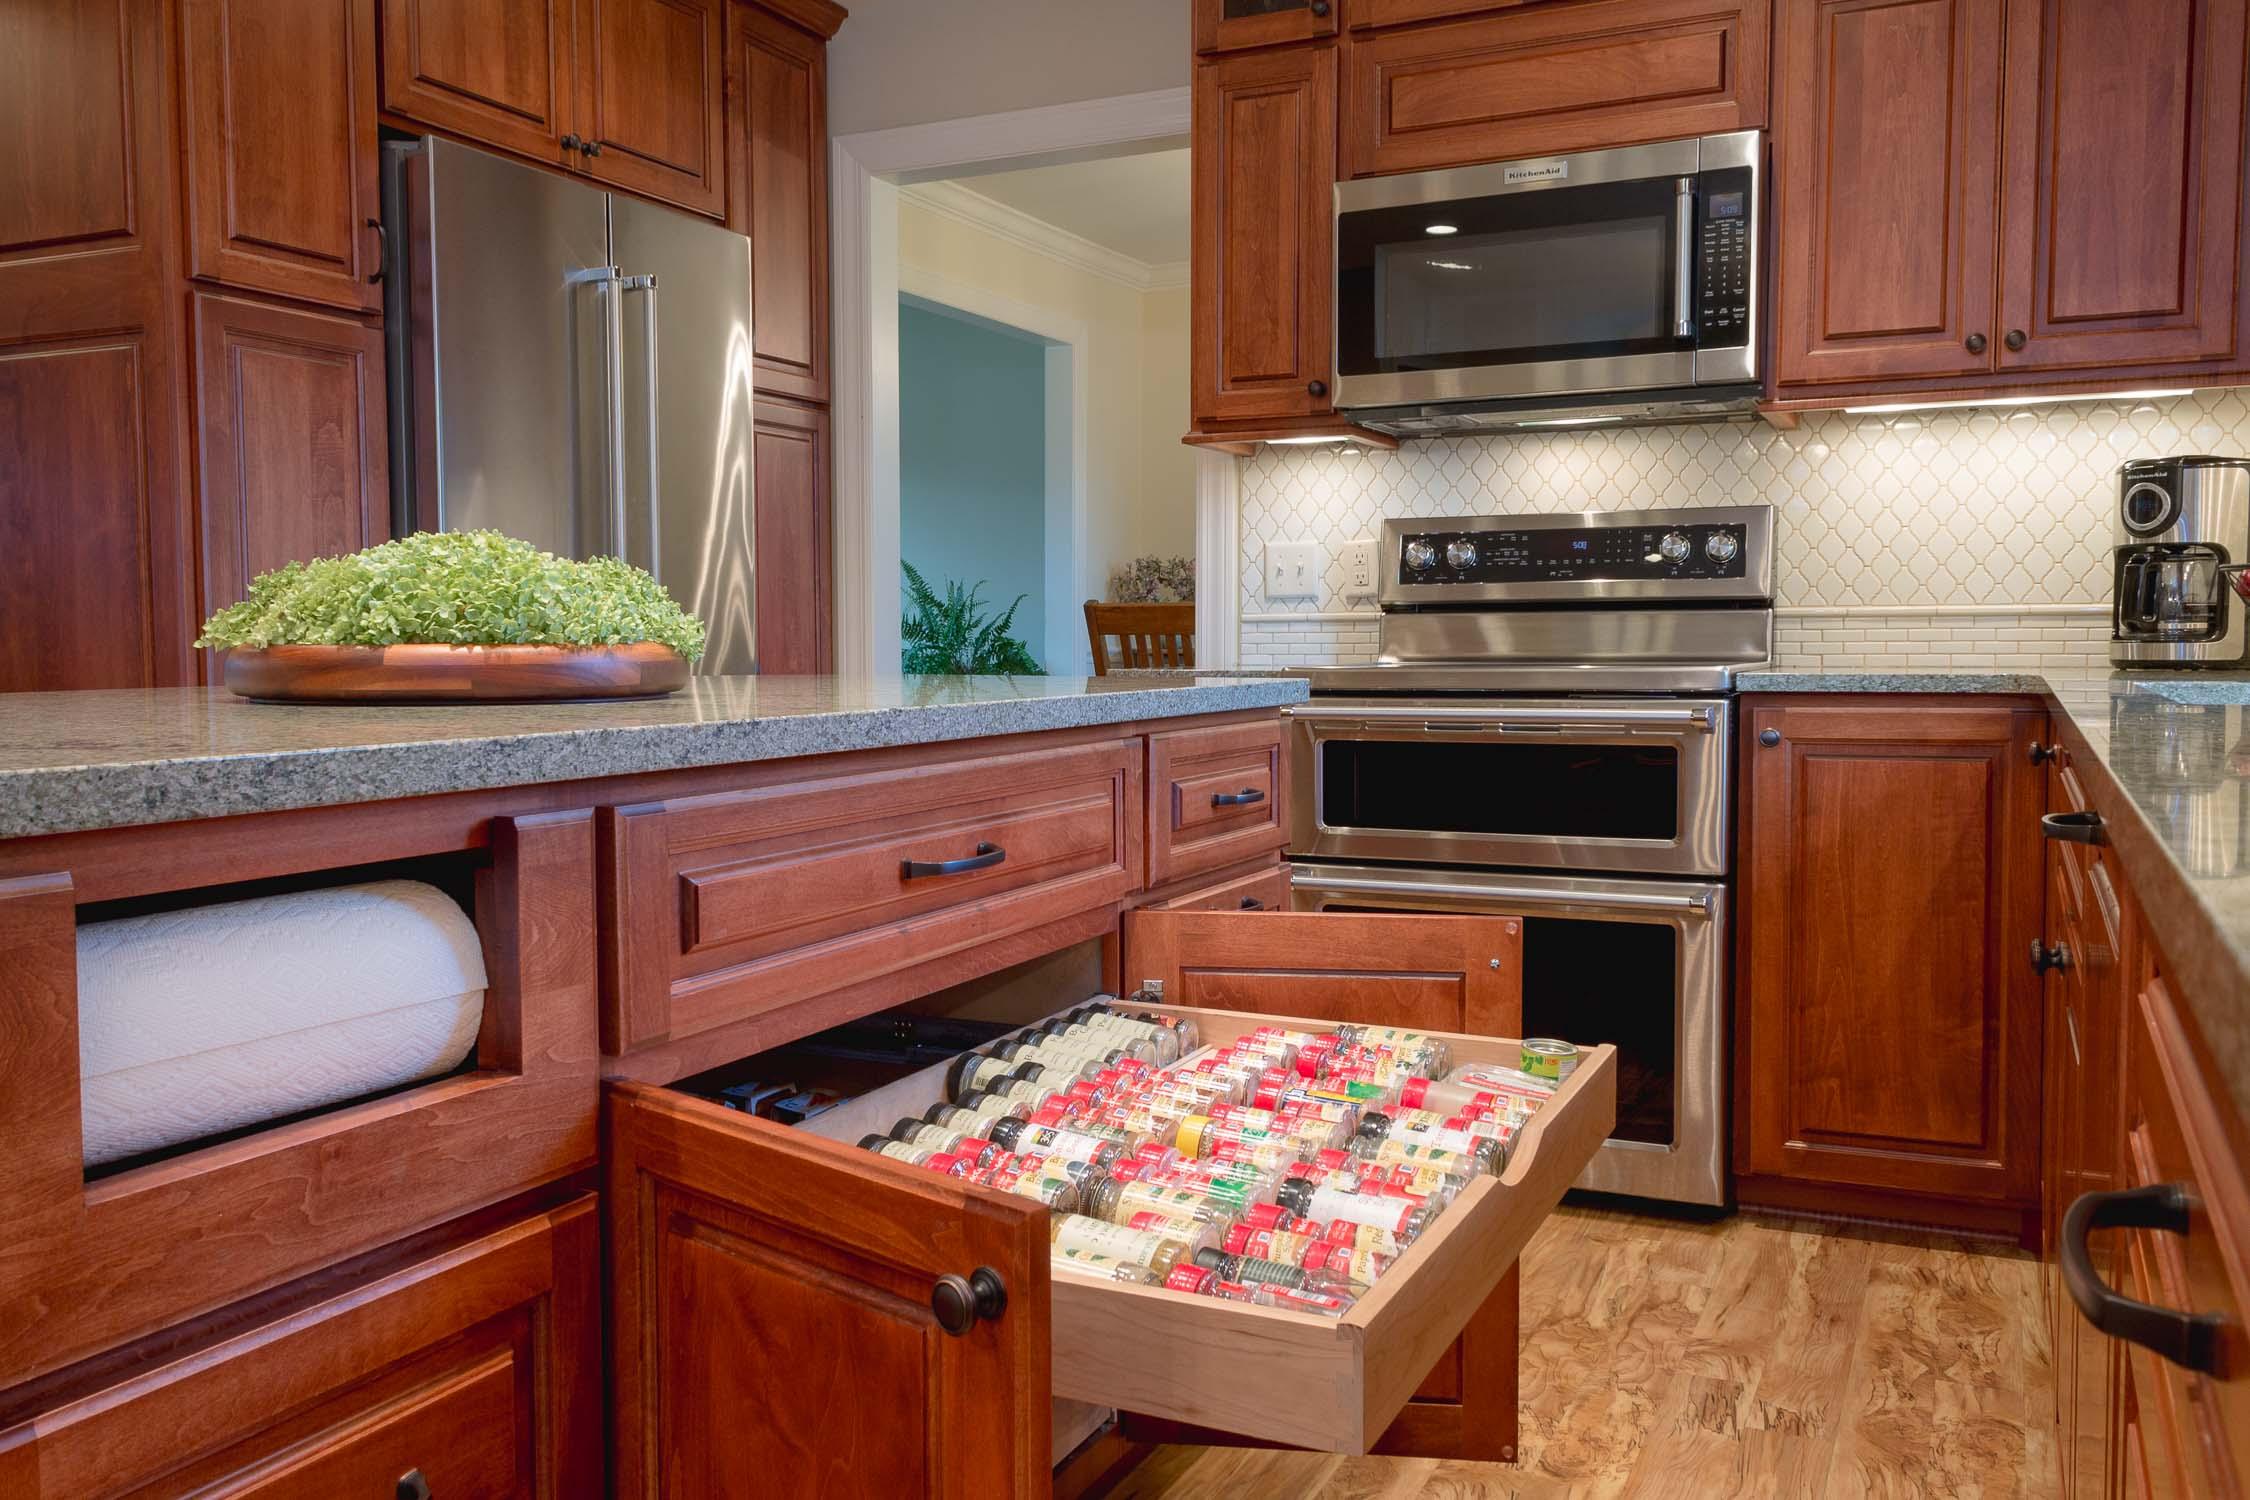 Small Kitchen Design Ideas That Maximize Storage Space Degnan Design Build Remodel